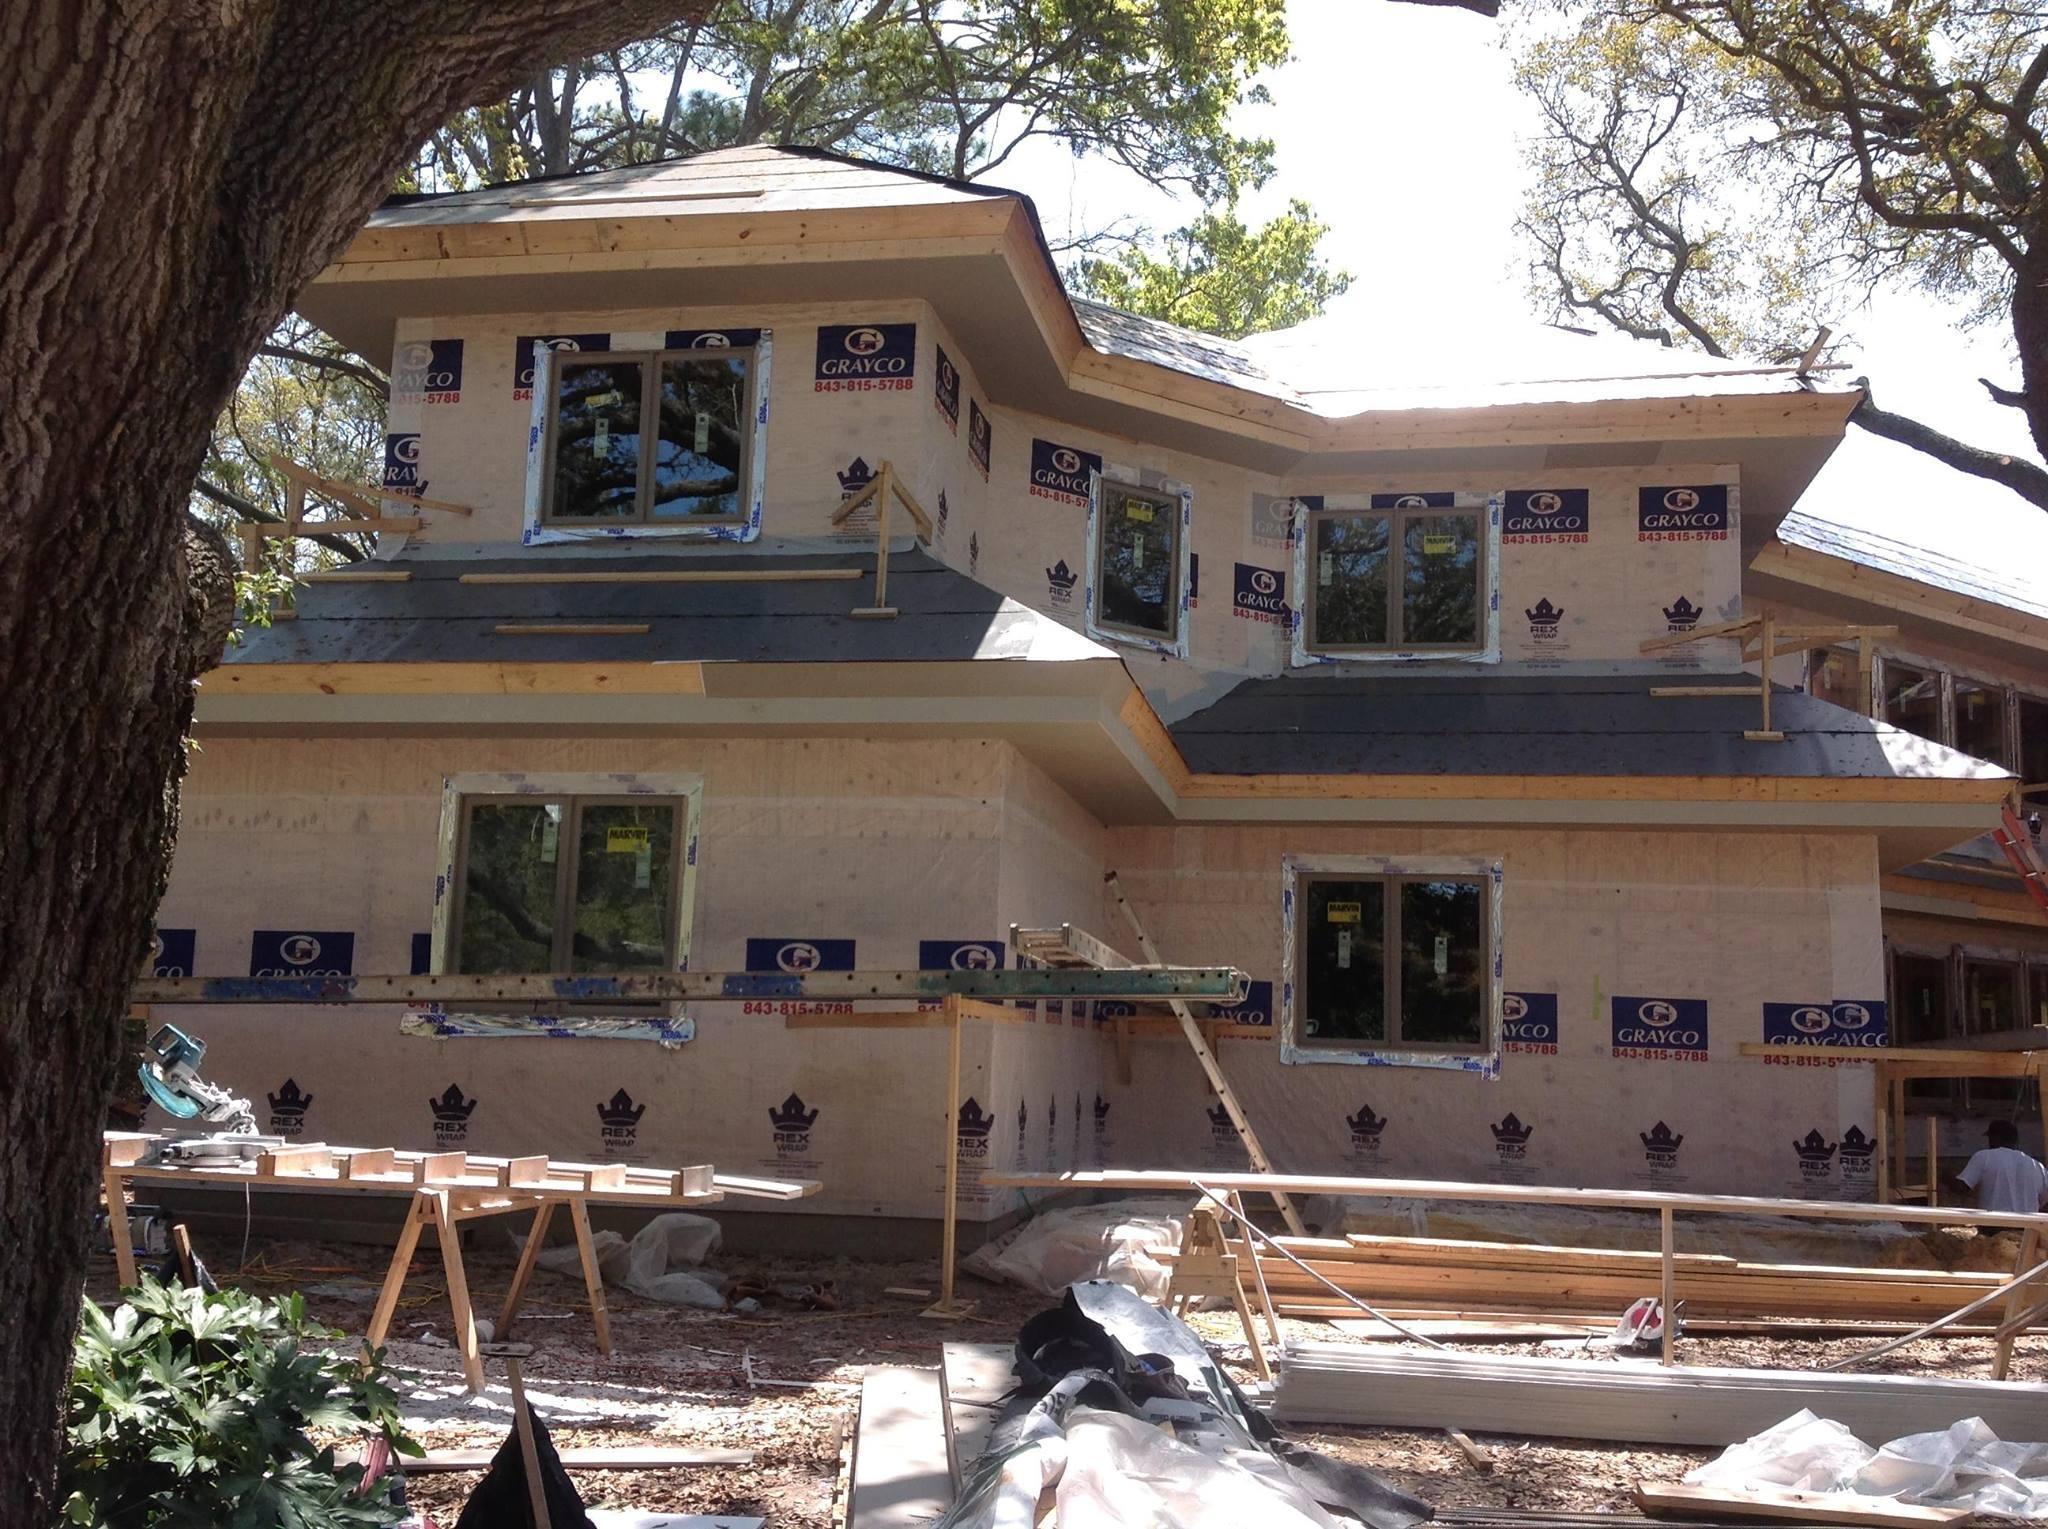 RoofCrafters-Savannah image 70